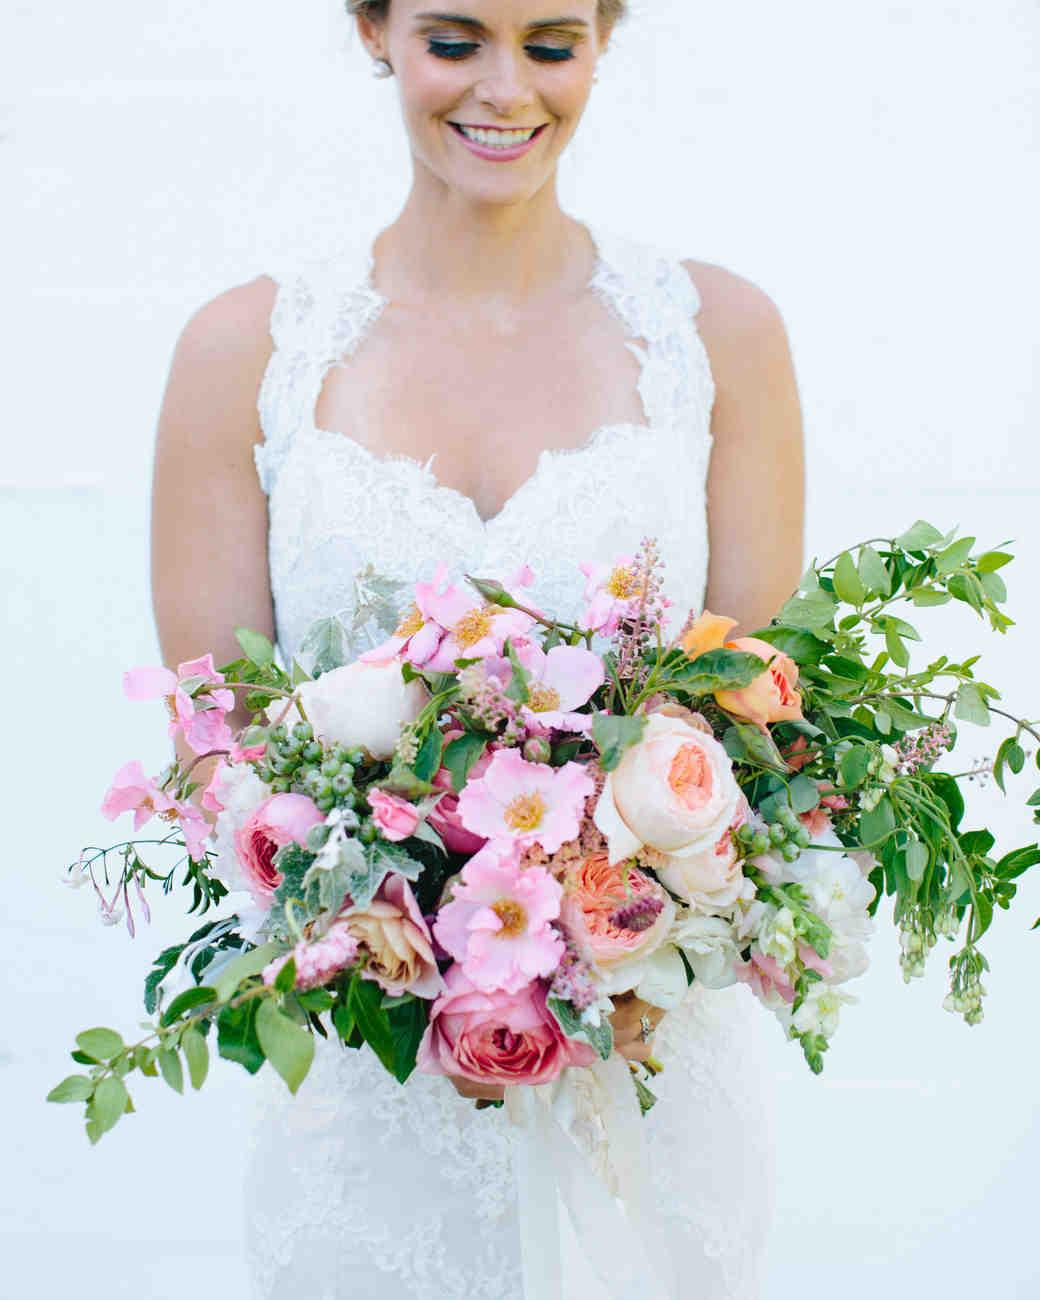 jamie-alex-wedding-bouquet-180-s111544-1014.jpg